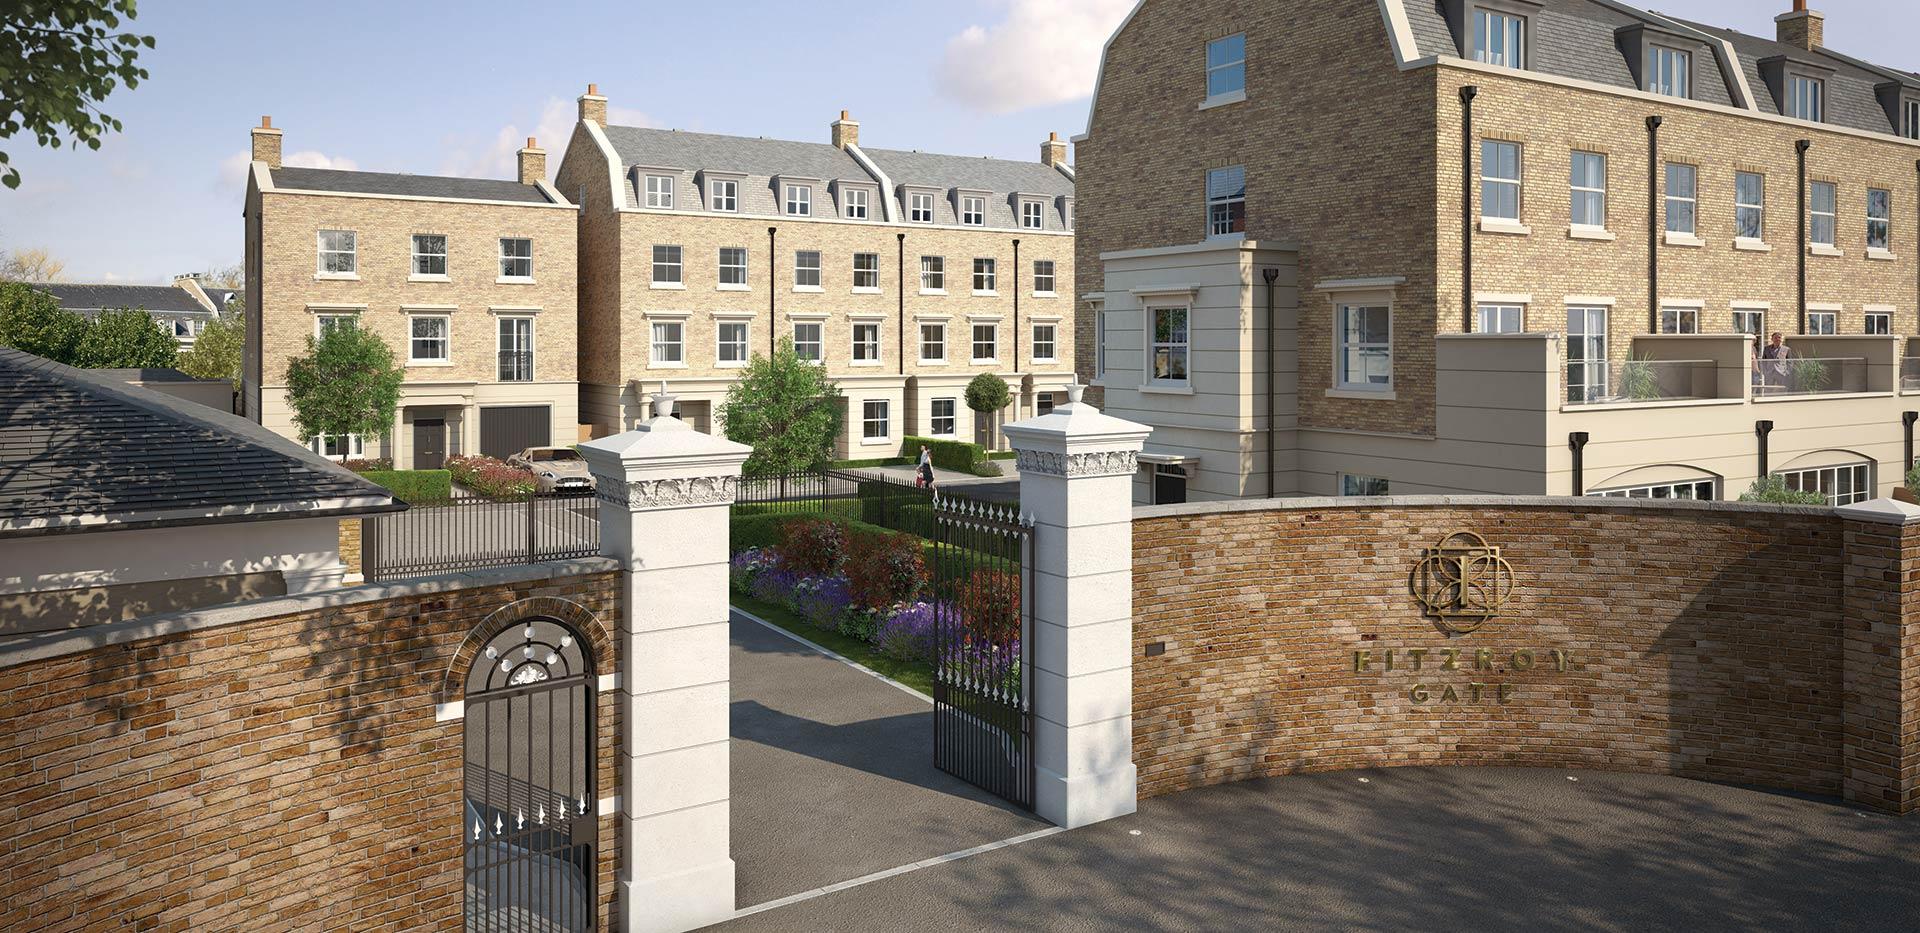 St James, Fitzroy Gate, Entrance, Exterior